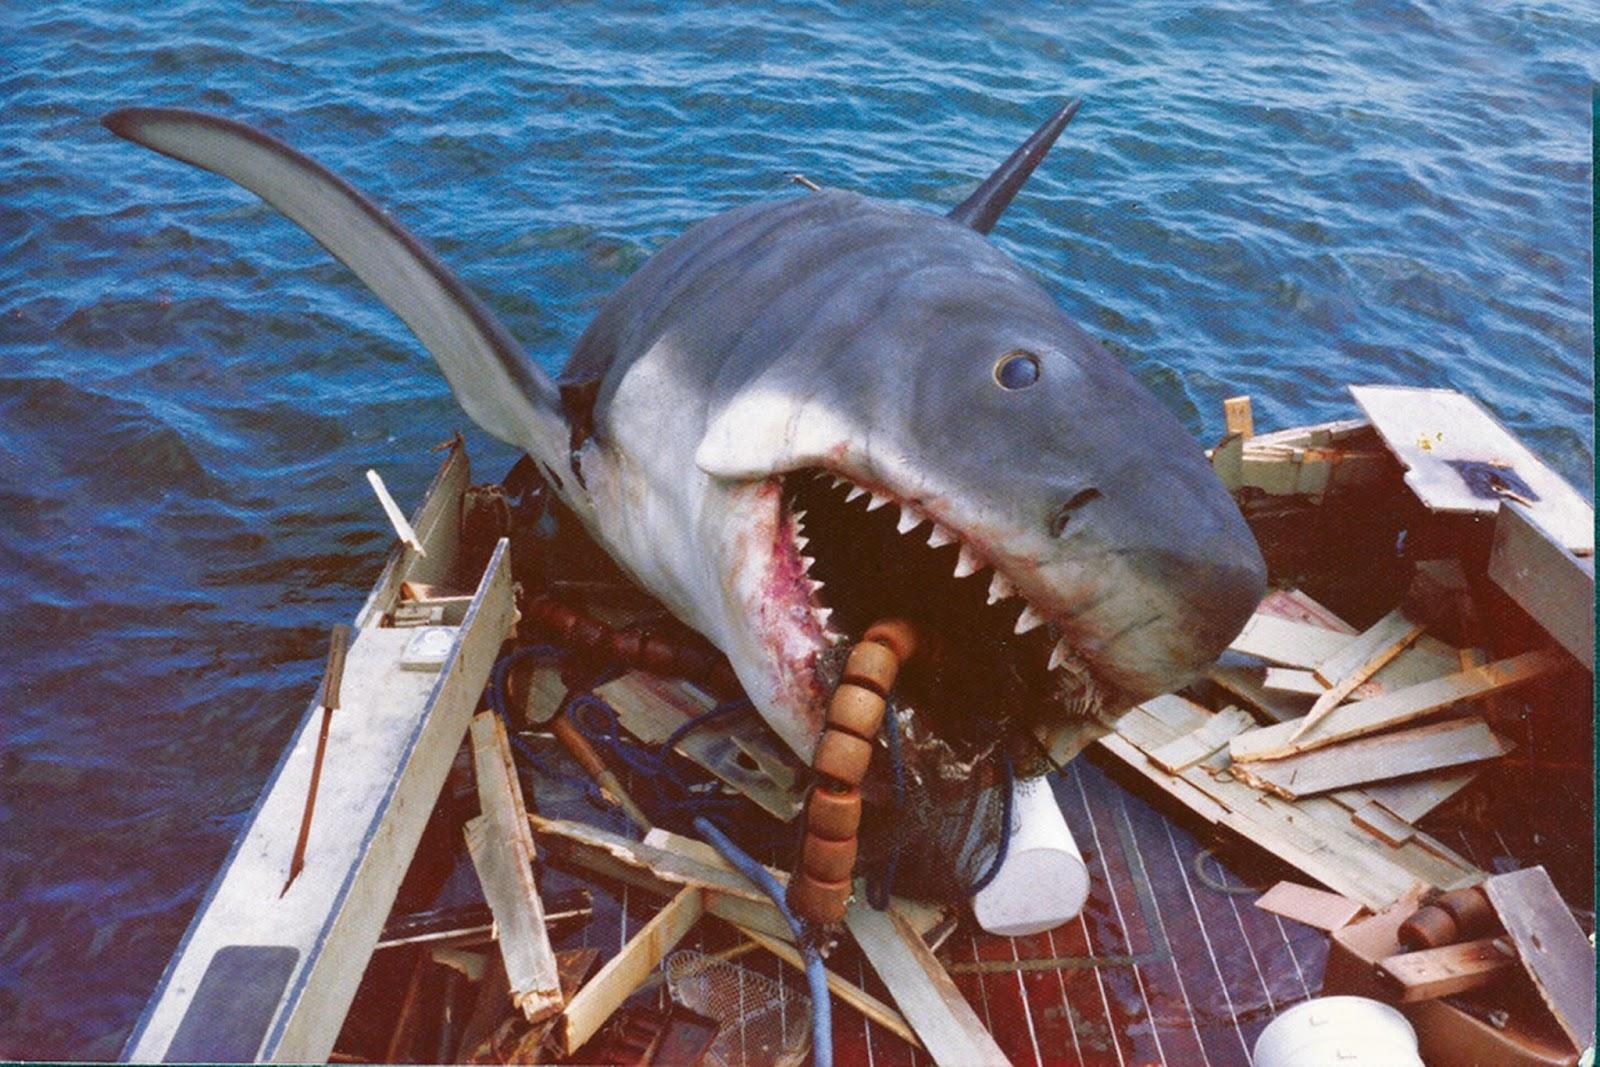 металлической кино про акул картинки сожалению